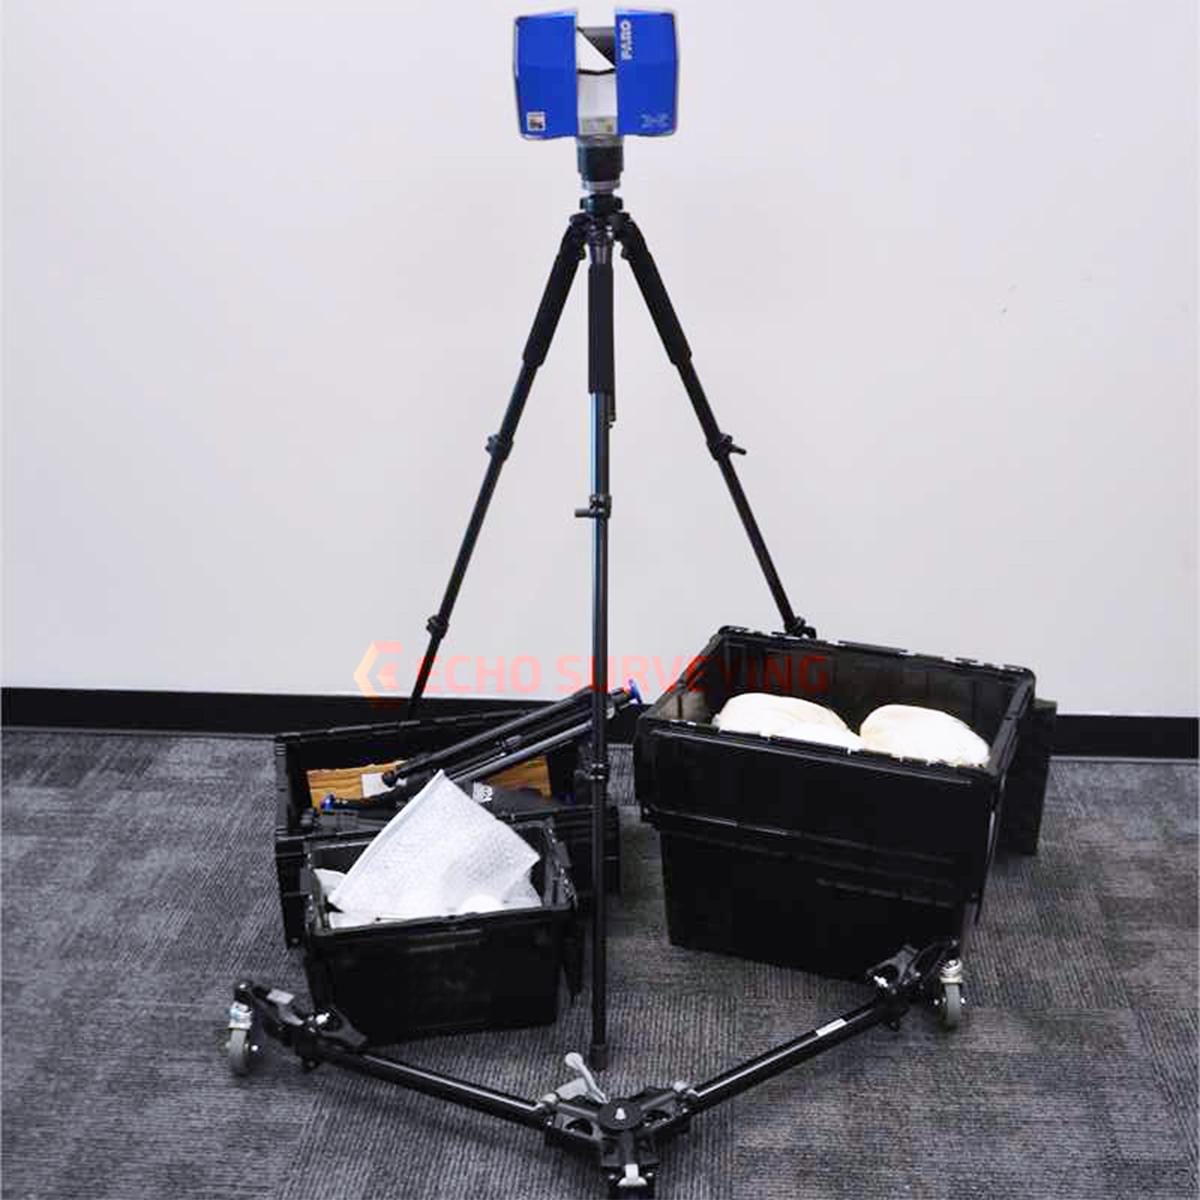 Used-Faro-Focus-3D-X-330-HDR-Laser-Scanner.jpg